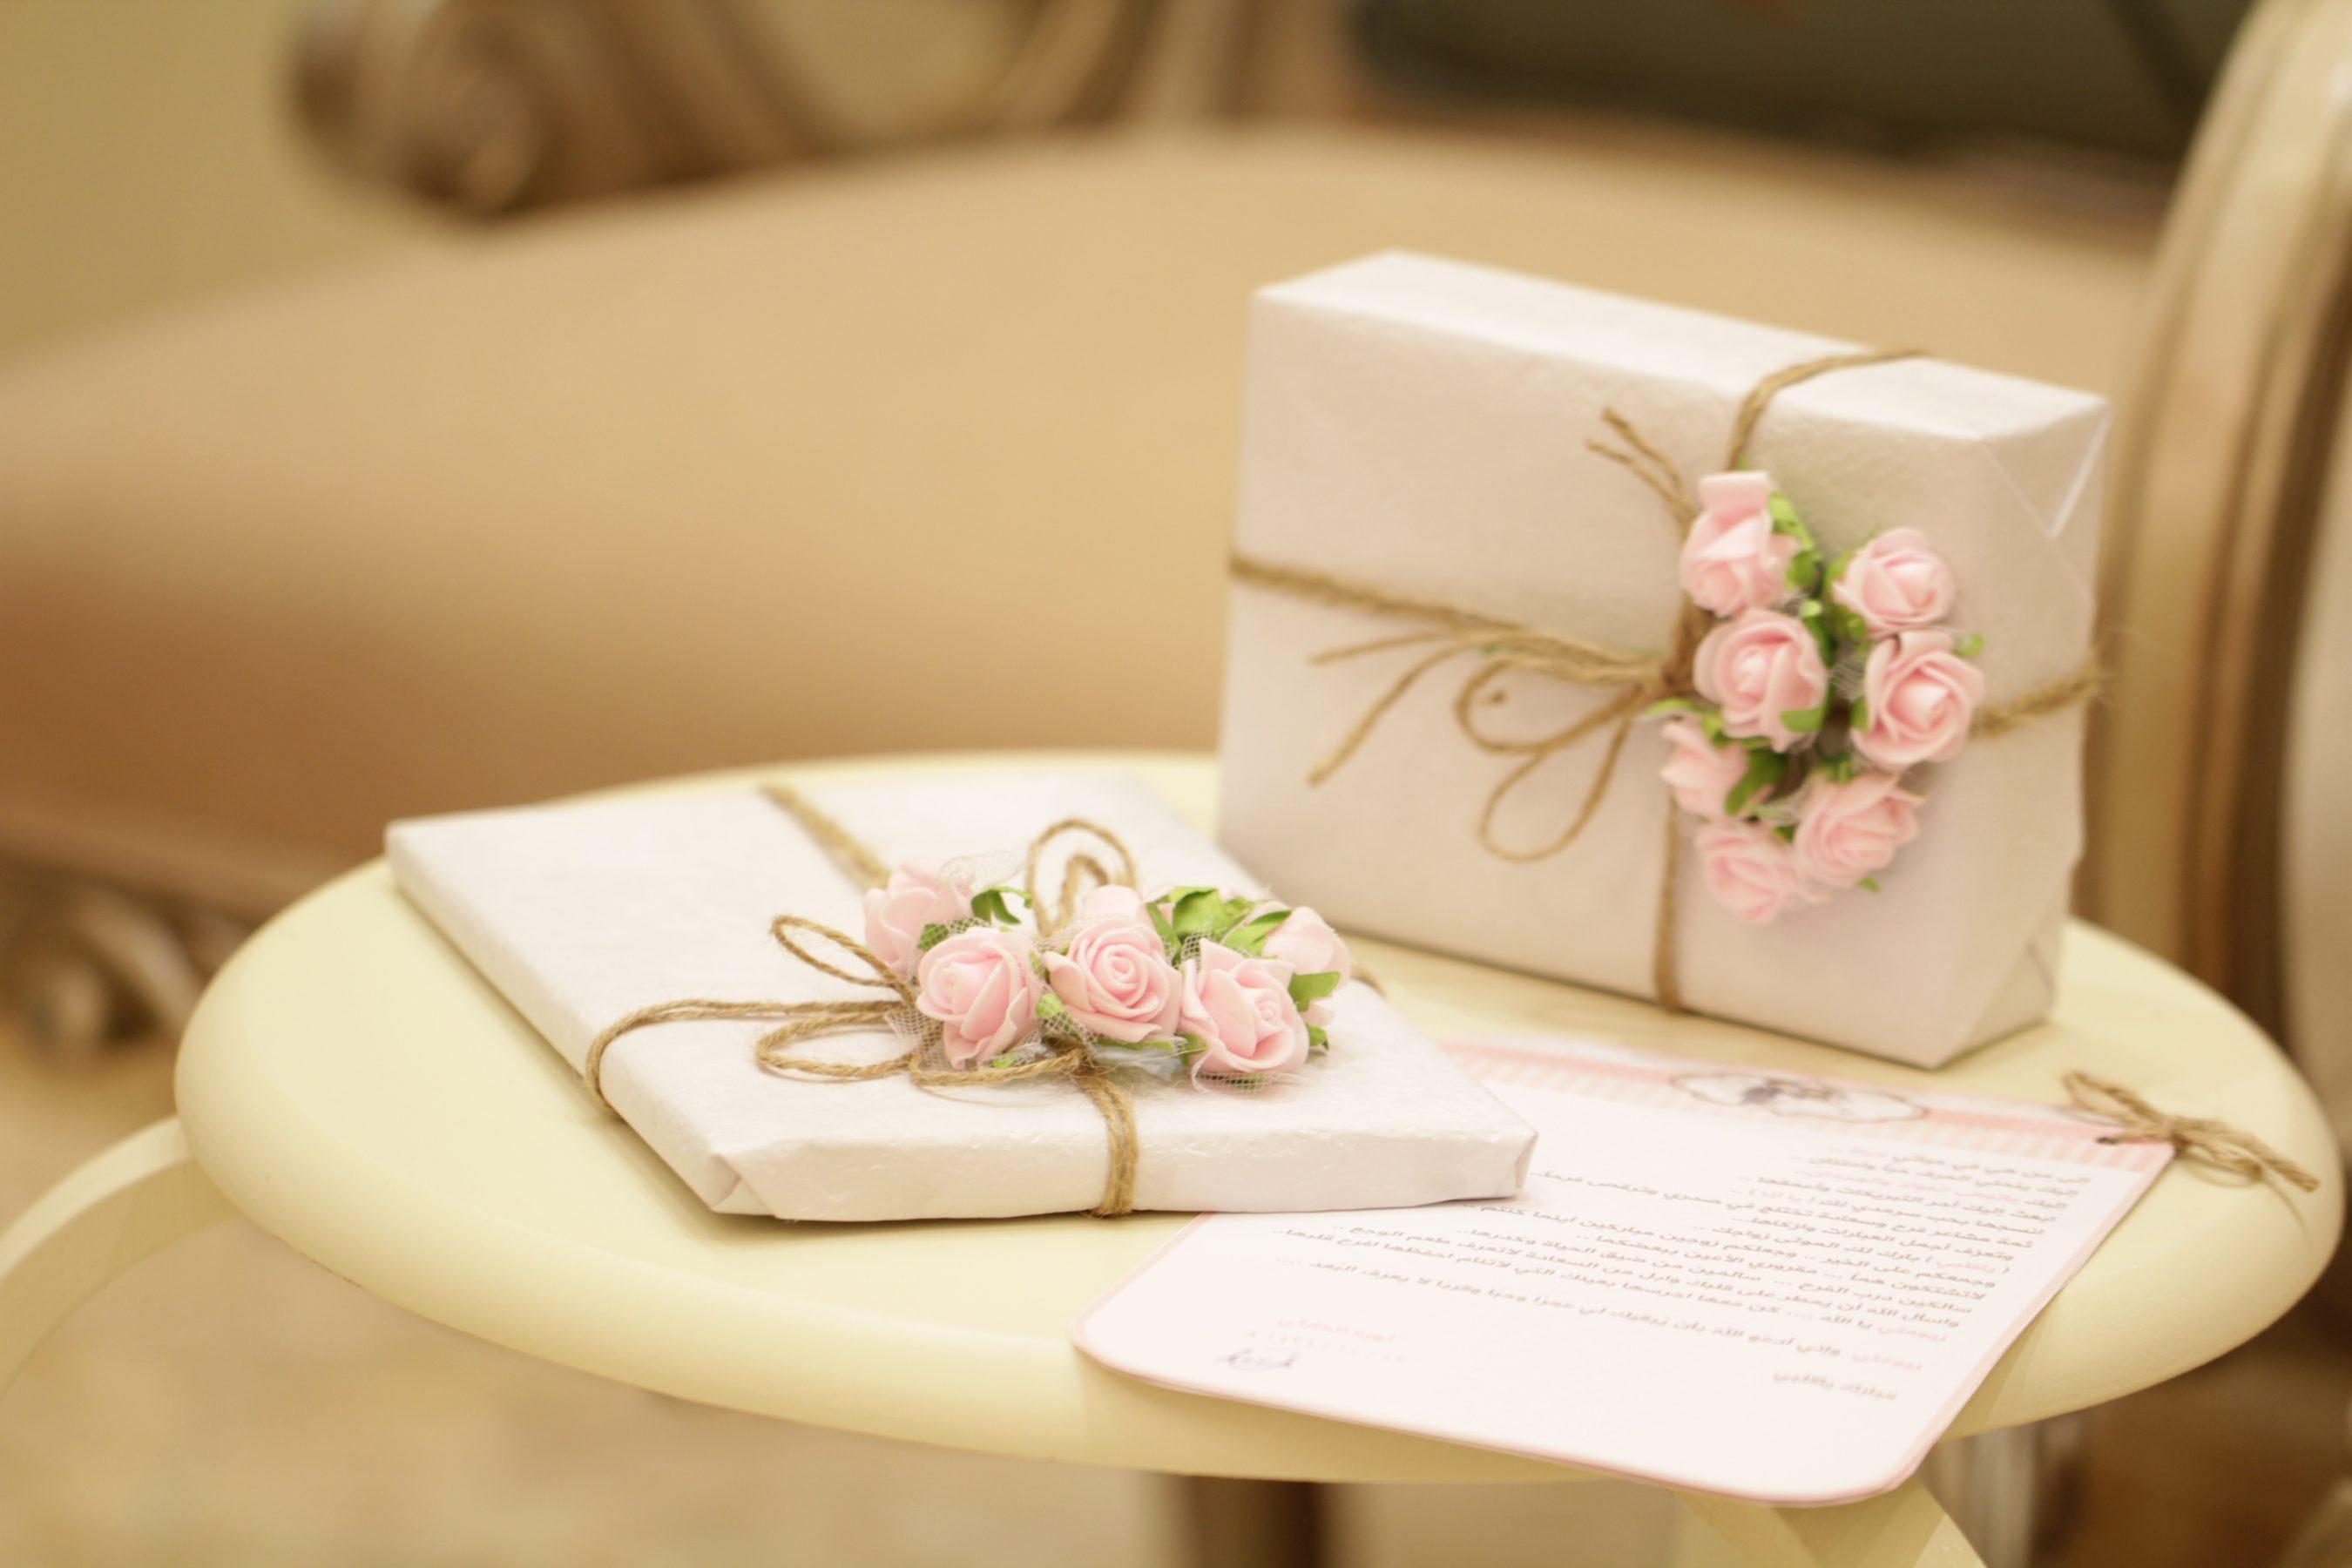 Dawanda geschenk trauzeuge